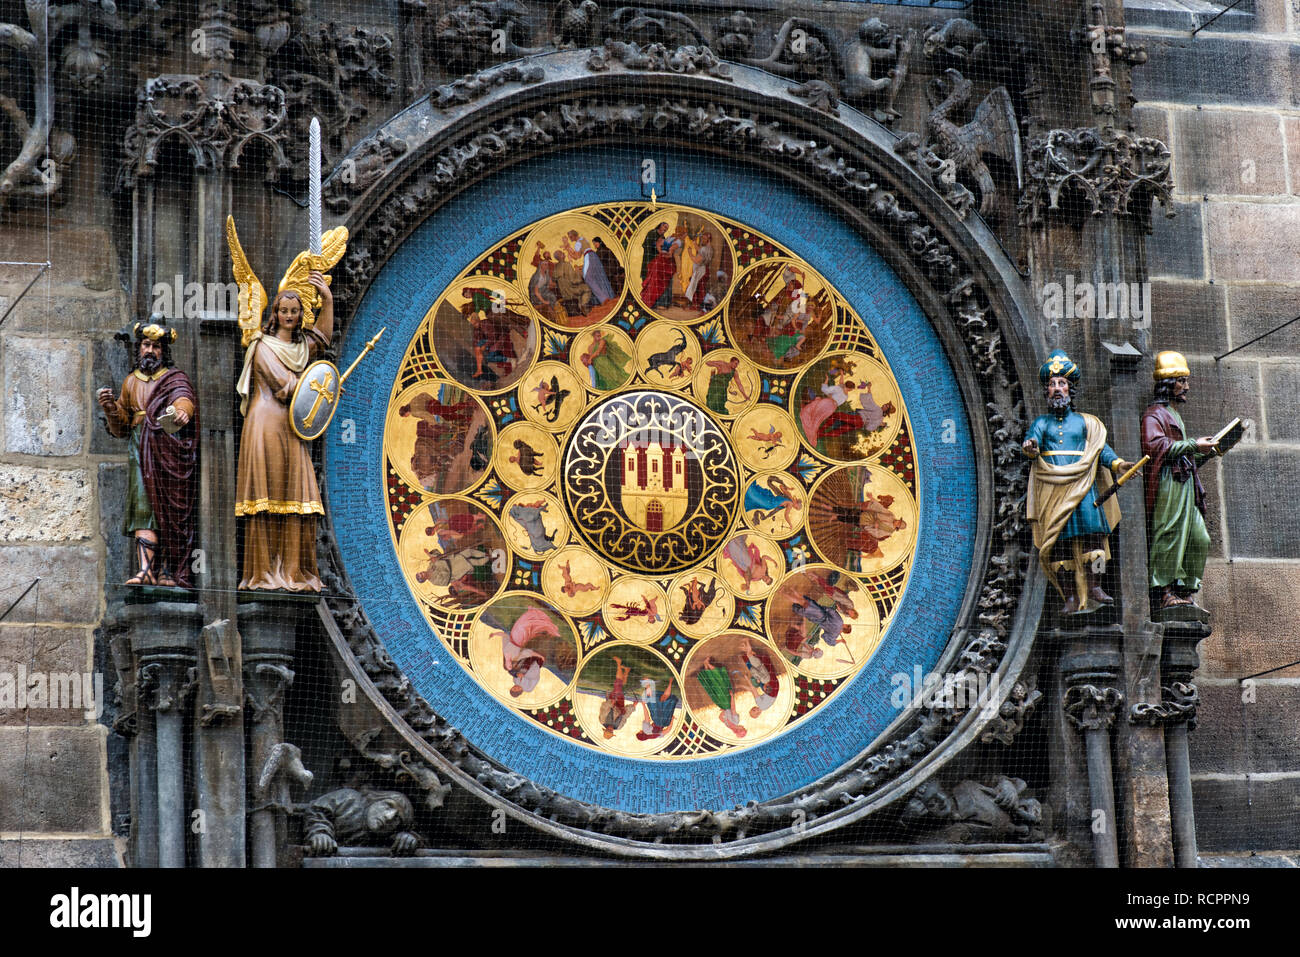 Prague. Czech Republic. Europe. Astrological old clock - Stock Image